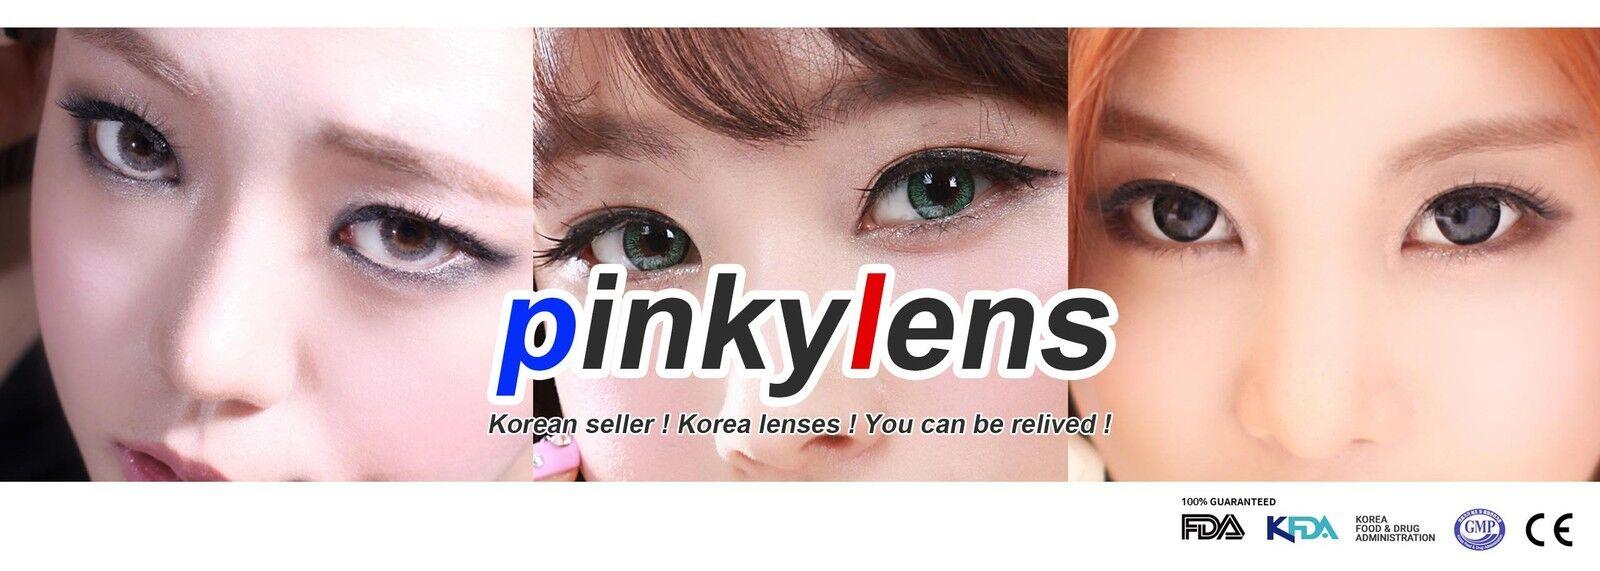 PINKYLENS-KOREA